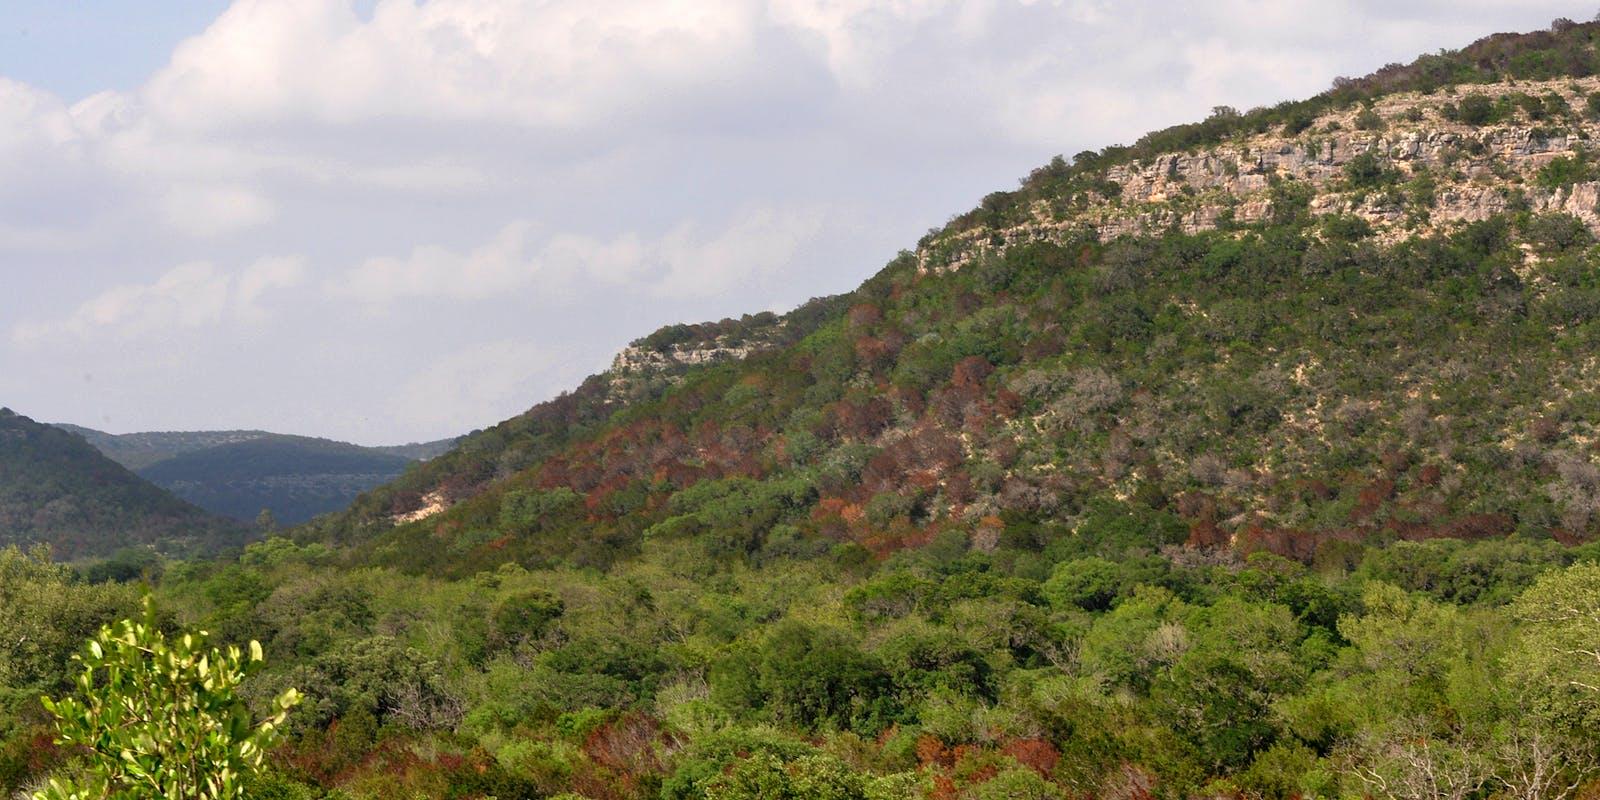 Edwards Plateau Savanna